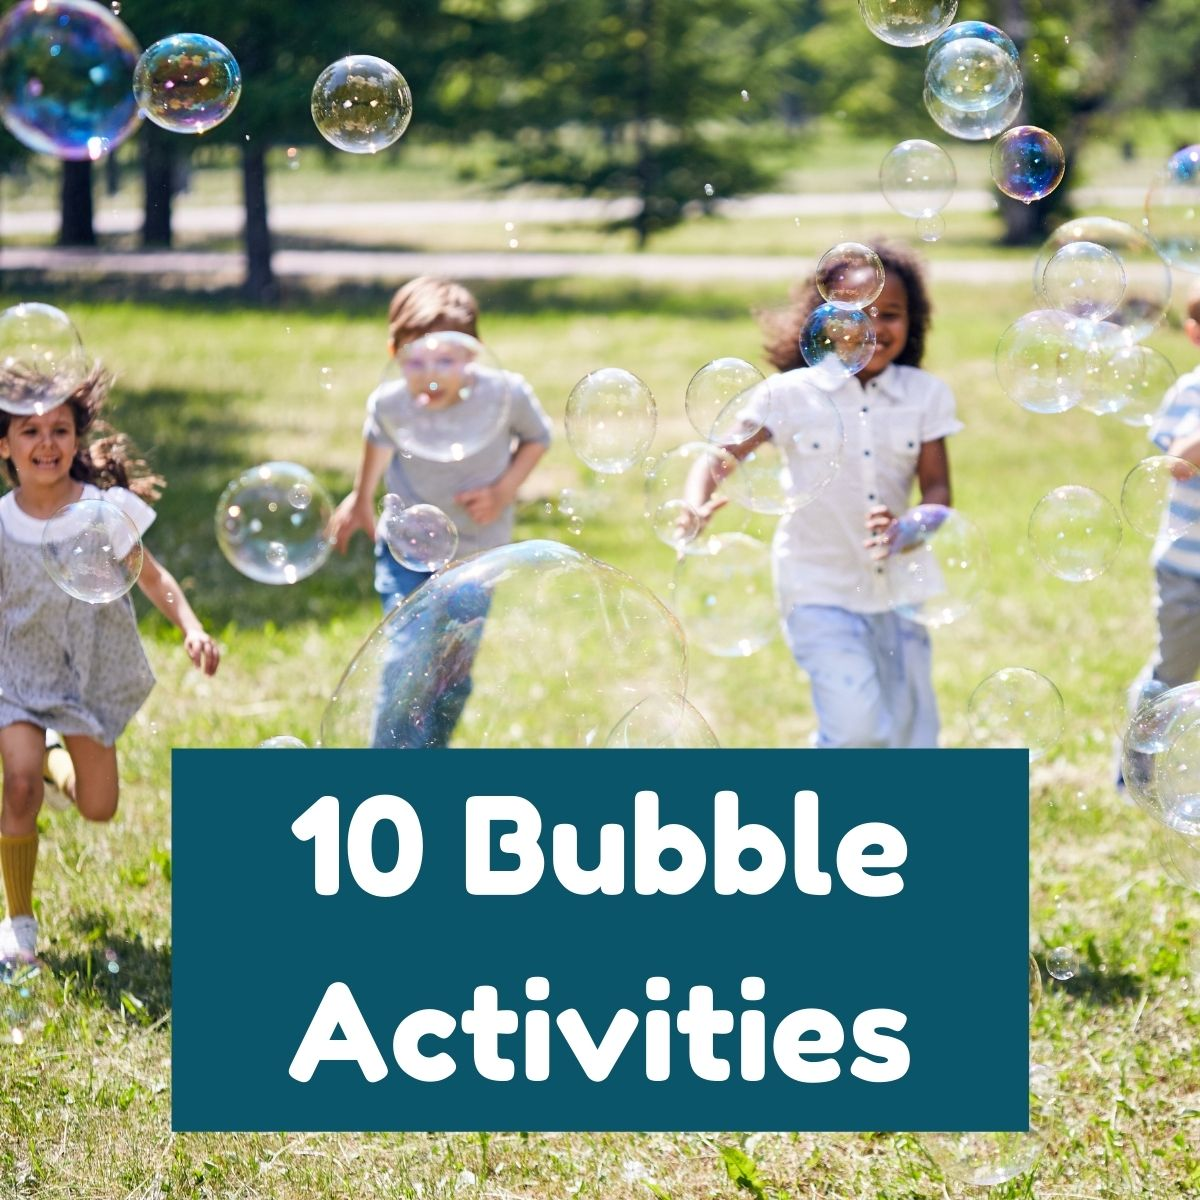 Children running after bubbles